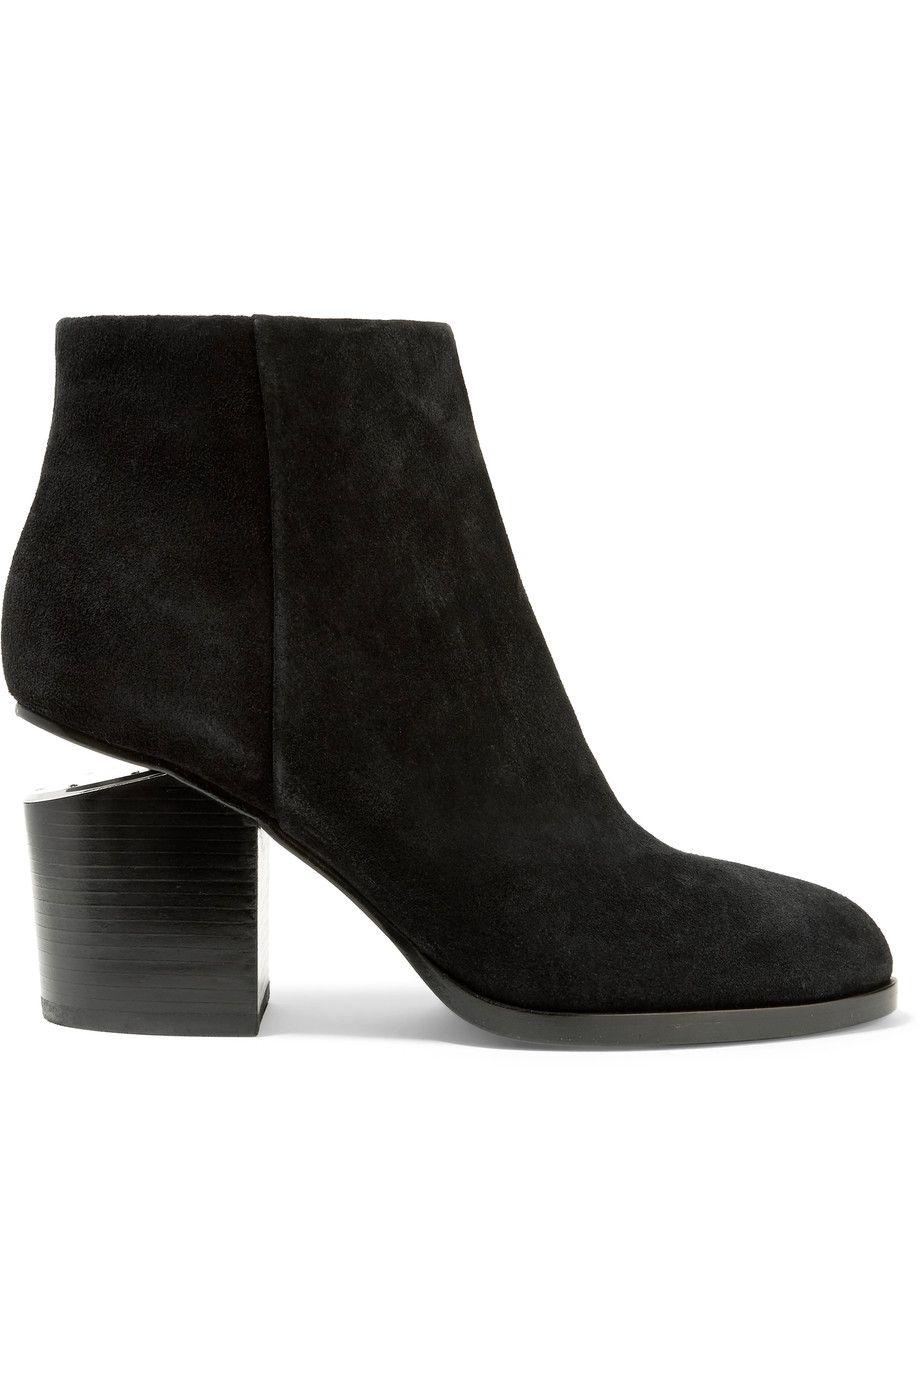 #alexanderwang #shoes #boots. Shoes Boots AnkleBlack SuedeAlexander ...